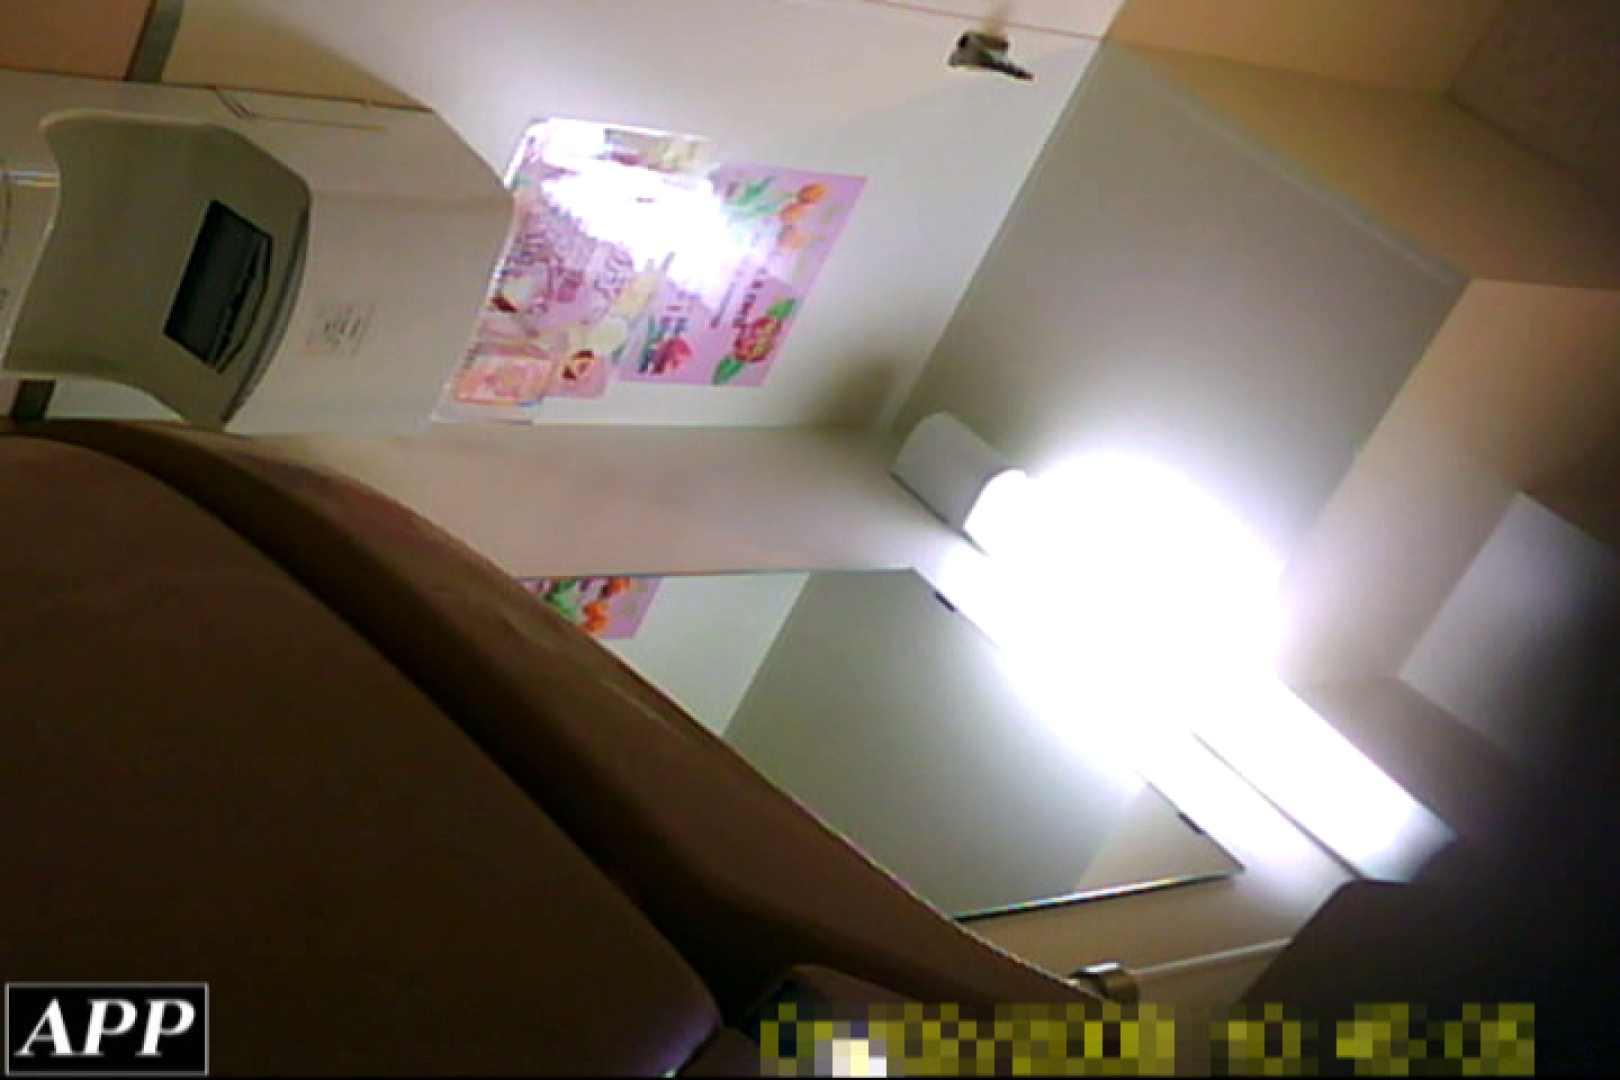 3視点洗面所 vol.121 OLハメ撮り  86Pix 37